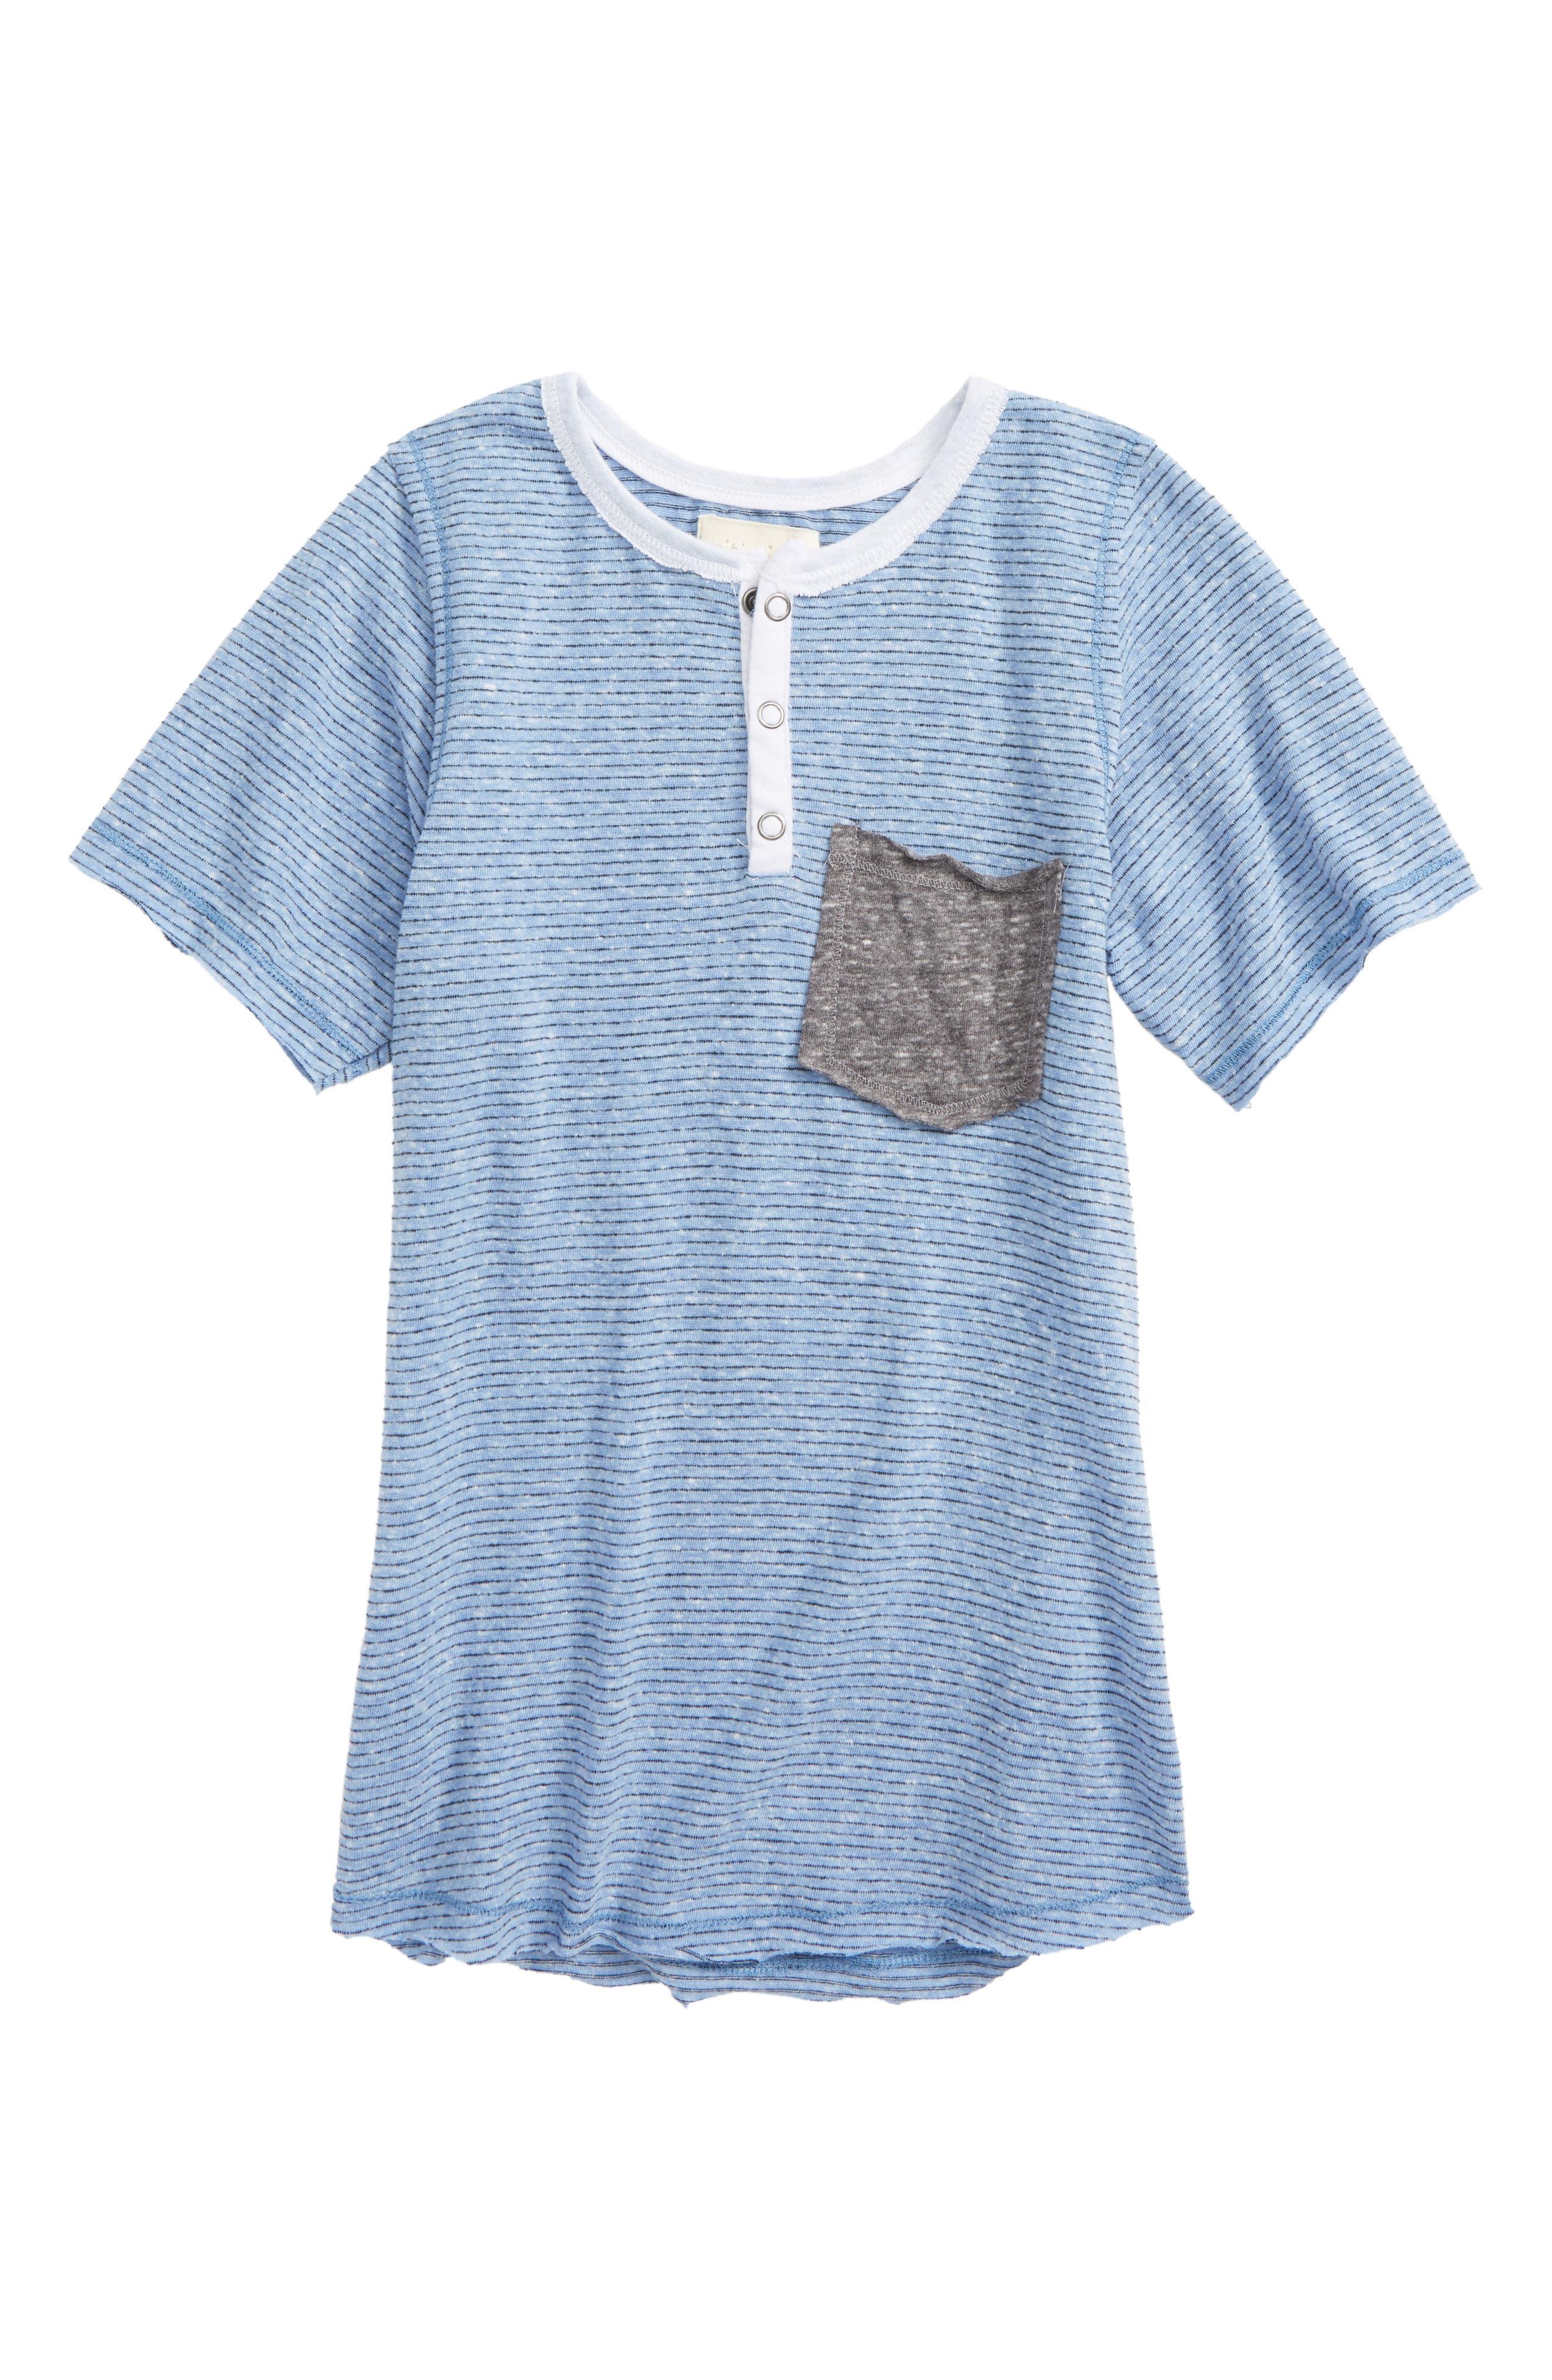 Miki Miette Jax Pocket T-Shirt (Toddler Boys, Little Boys & Big Boys)